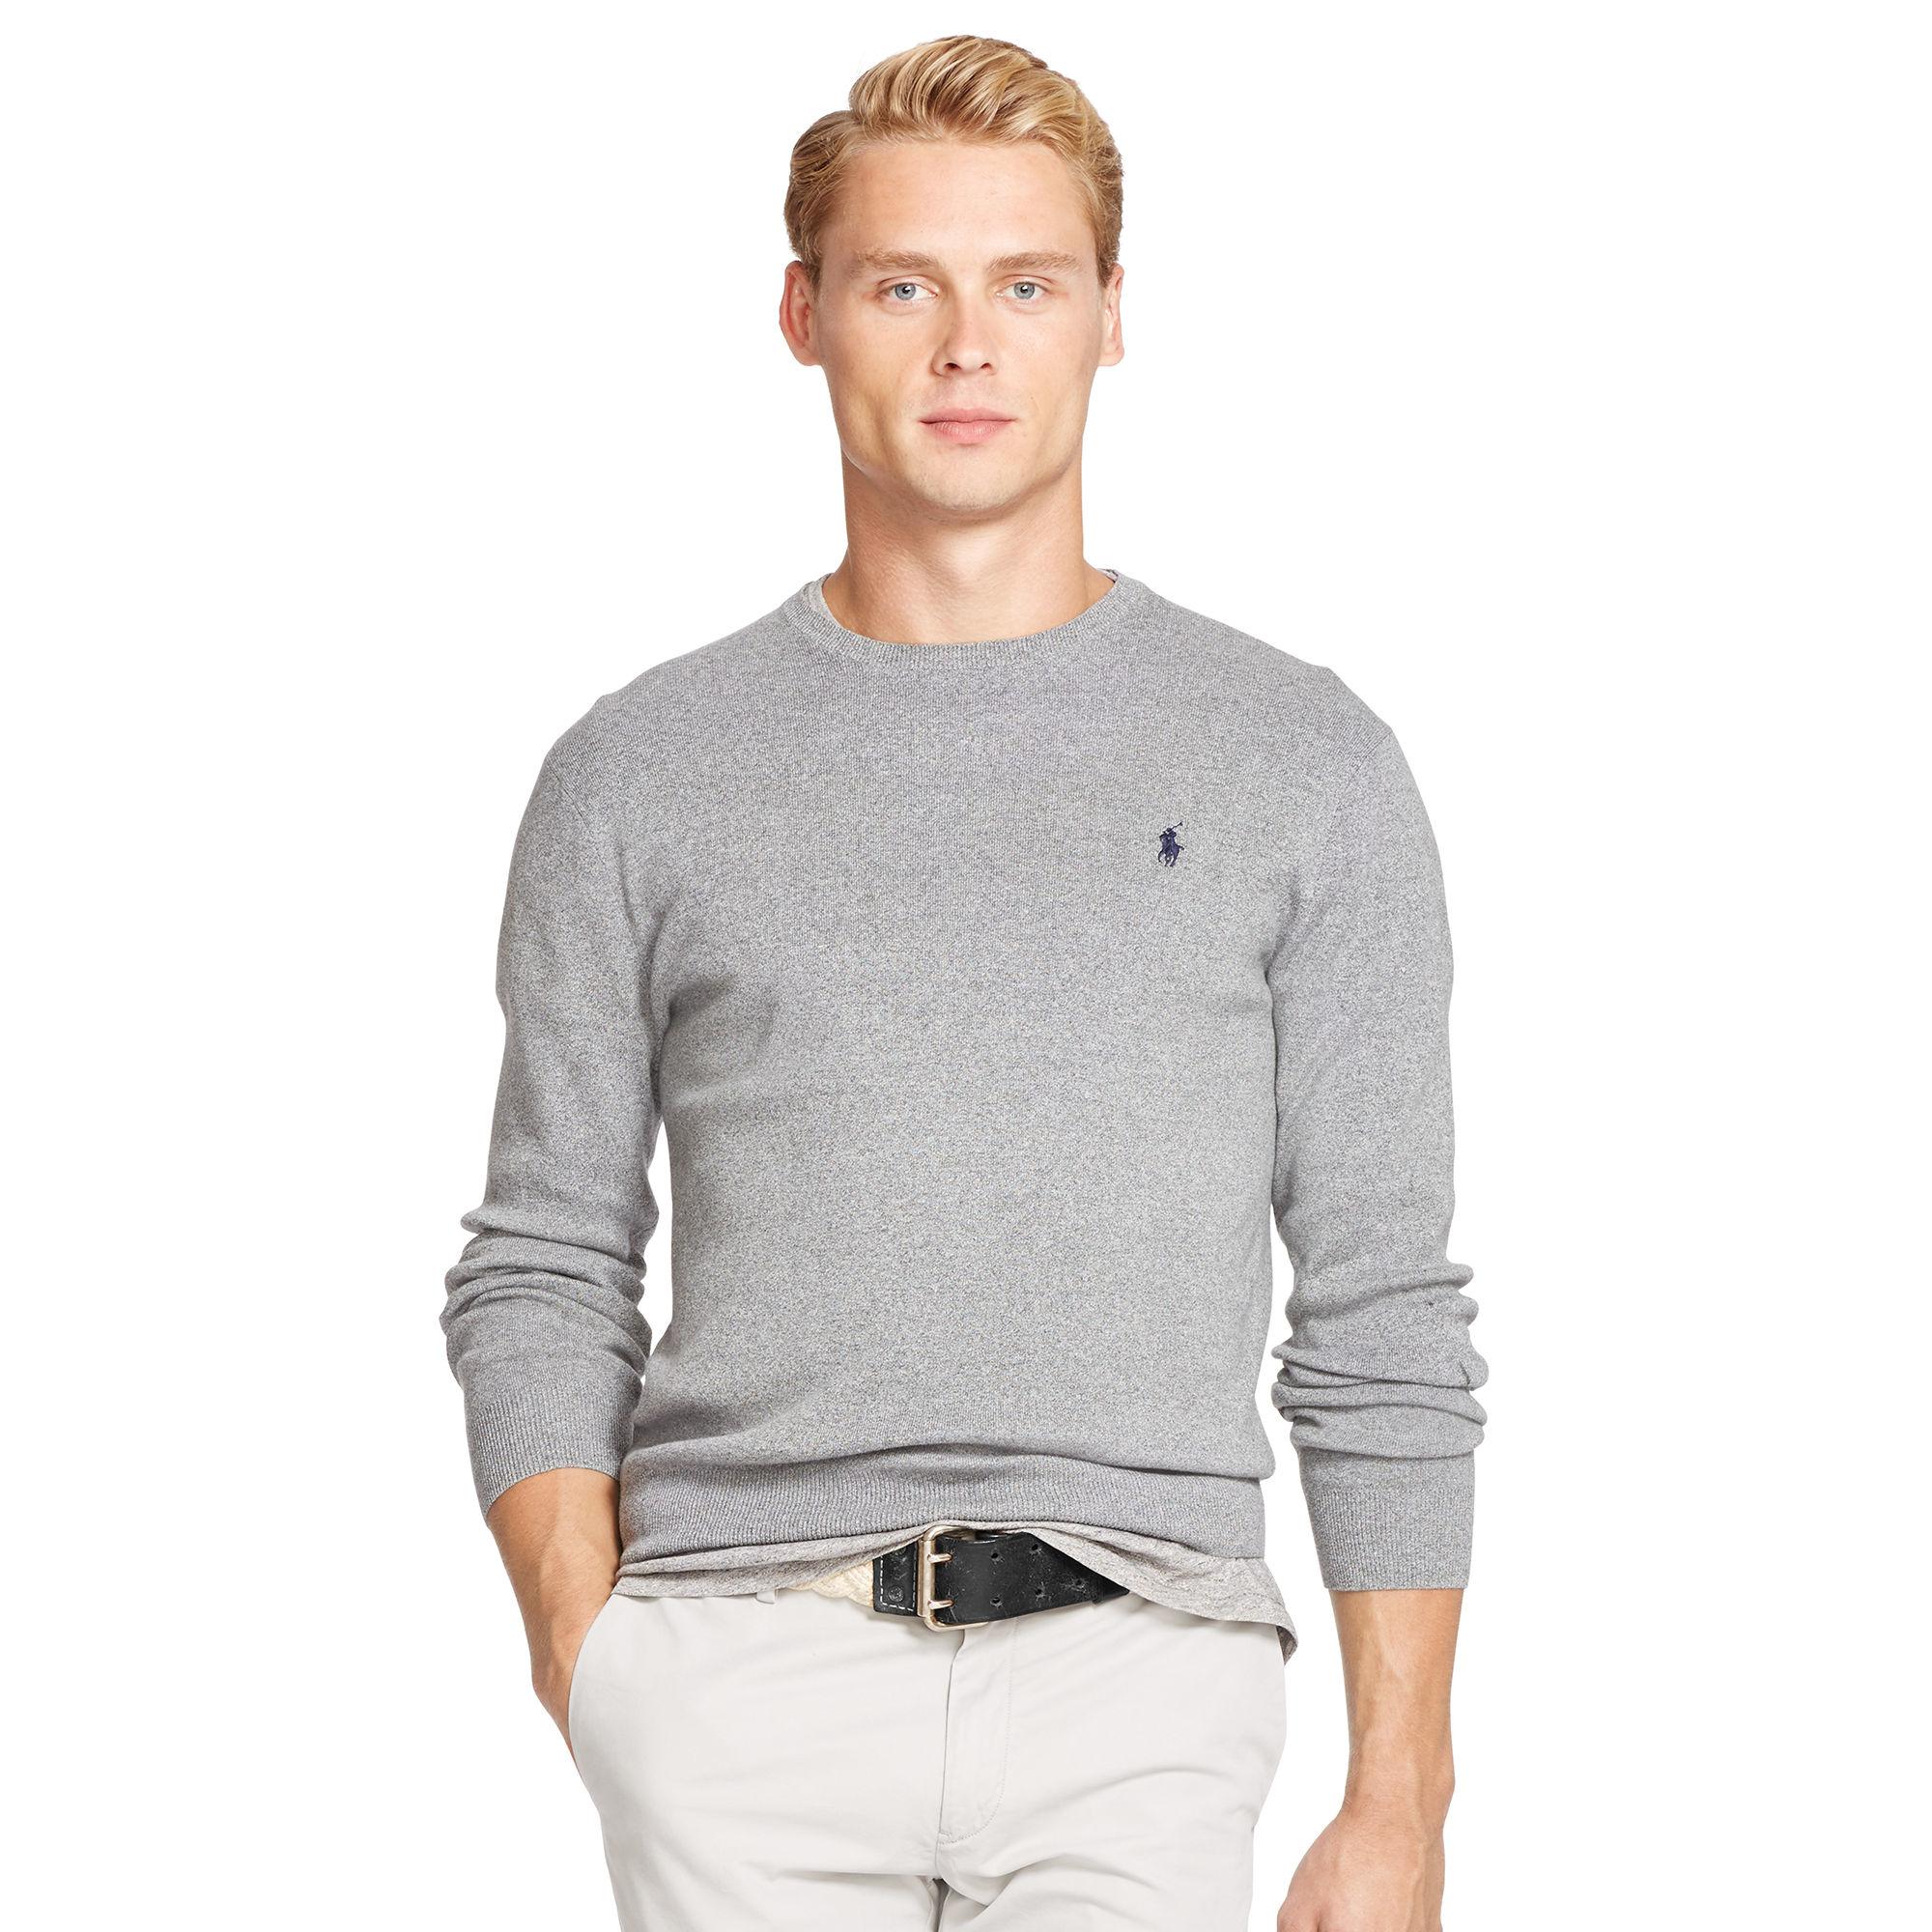 34d3a84efaac4 Polo Ralph Lauren Pima Cotton Crewneck Sweater in Gray for Men - Lyst